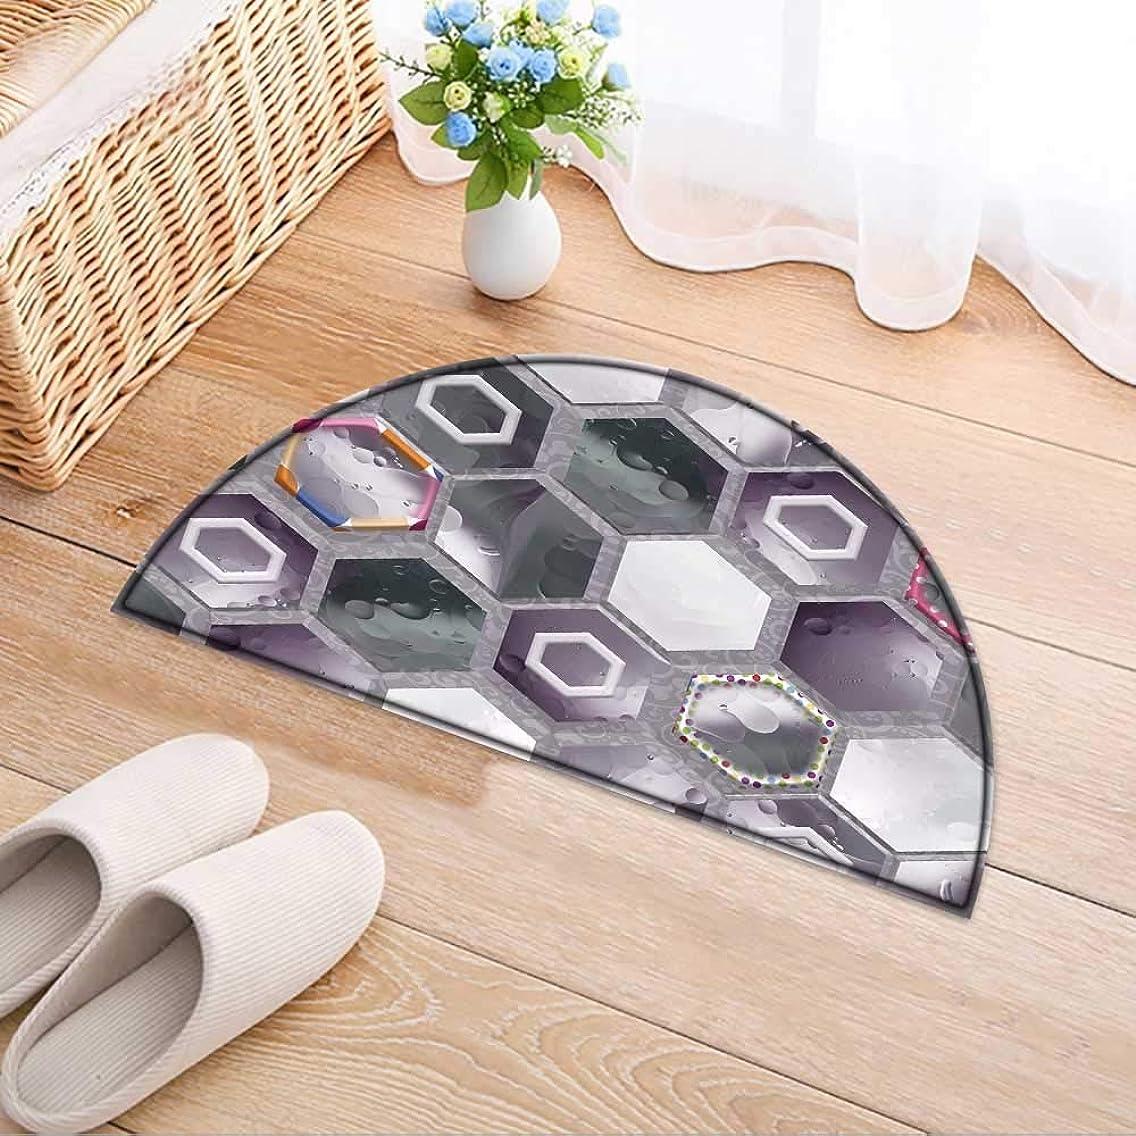 Semicircle Area Rug Carpet Tiles Decor Door mat Indoors Bathroom Mats Non Slip W24 x H16 INCH